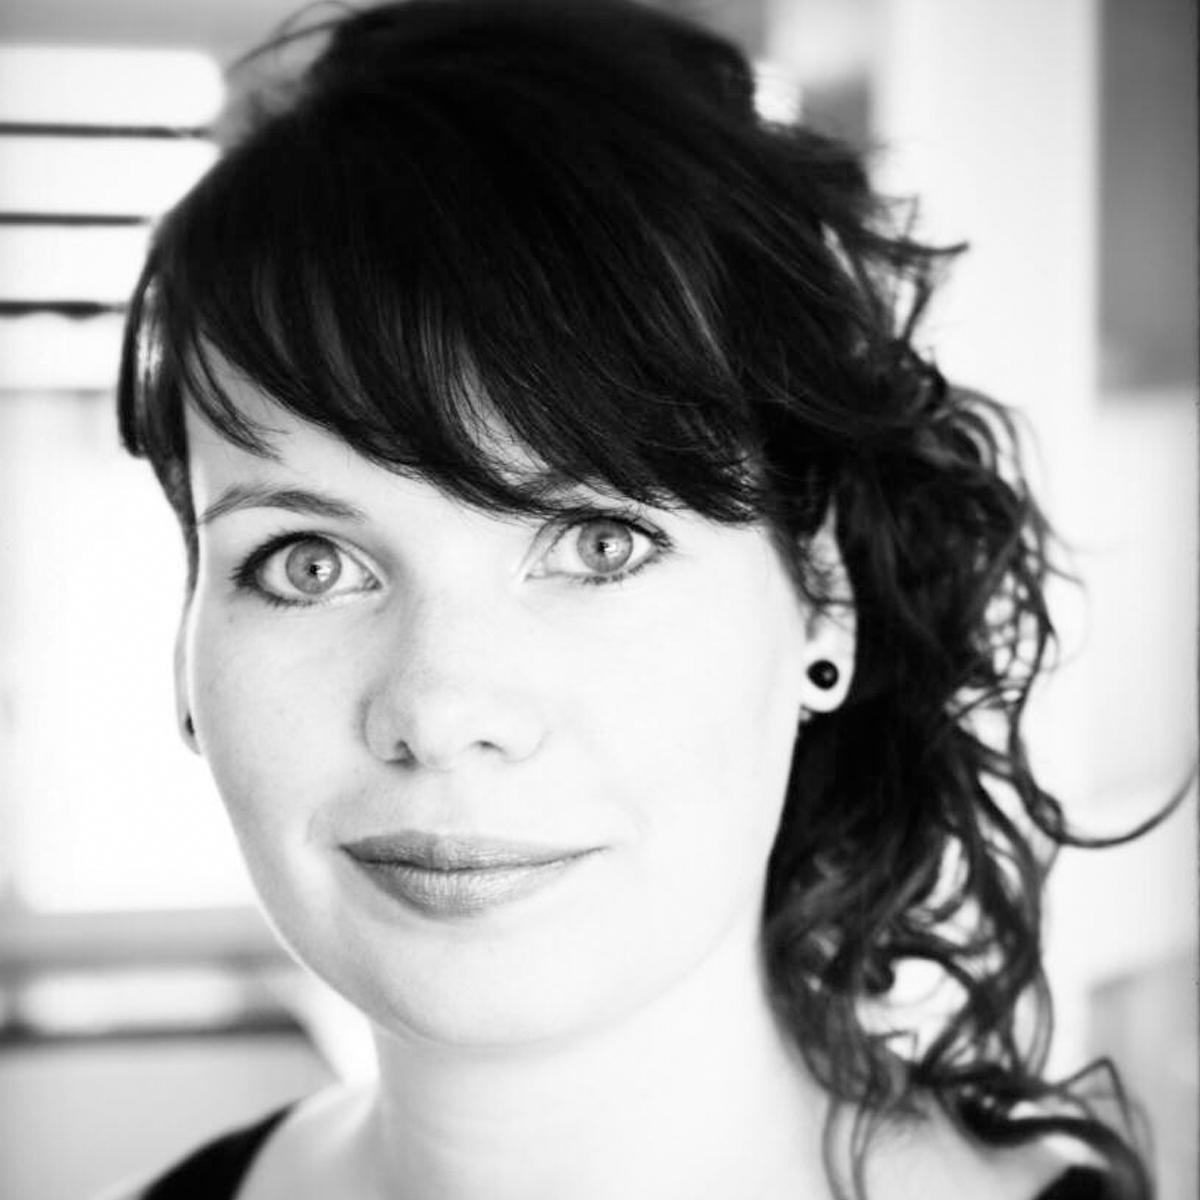 Annemiek Berendsen-van Lochem